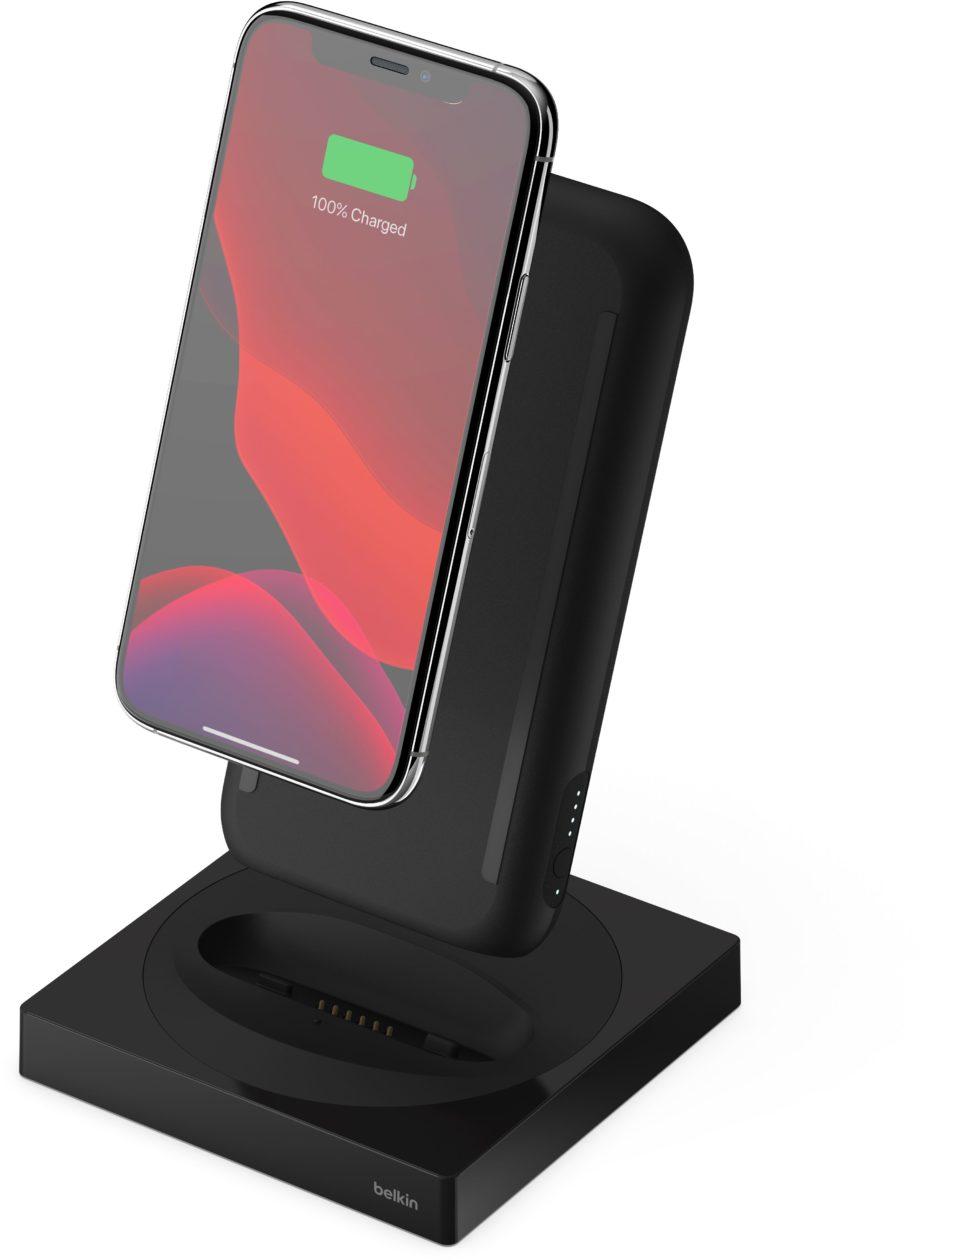 Stand BOOSTCHARGE Wireless da Belkin